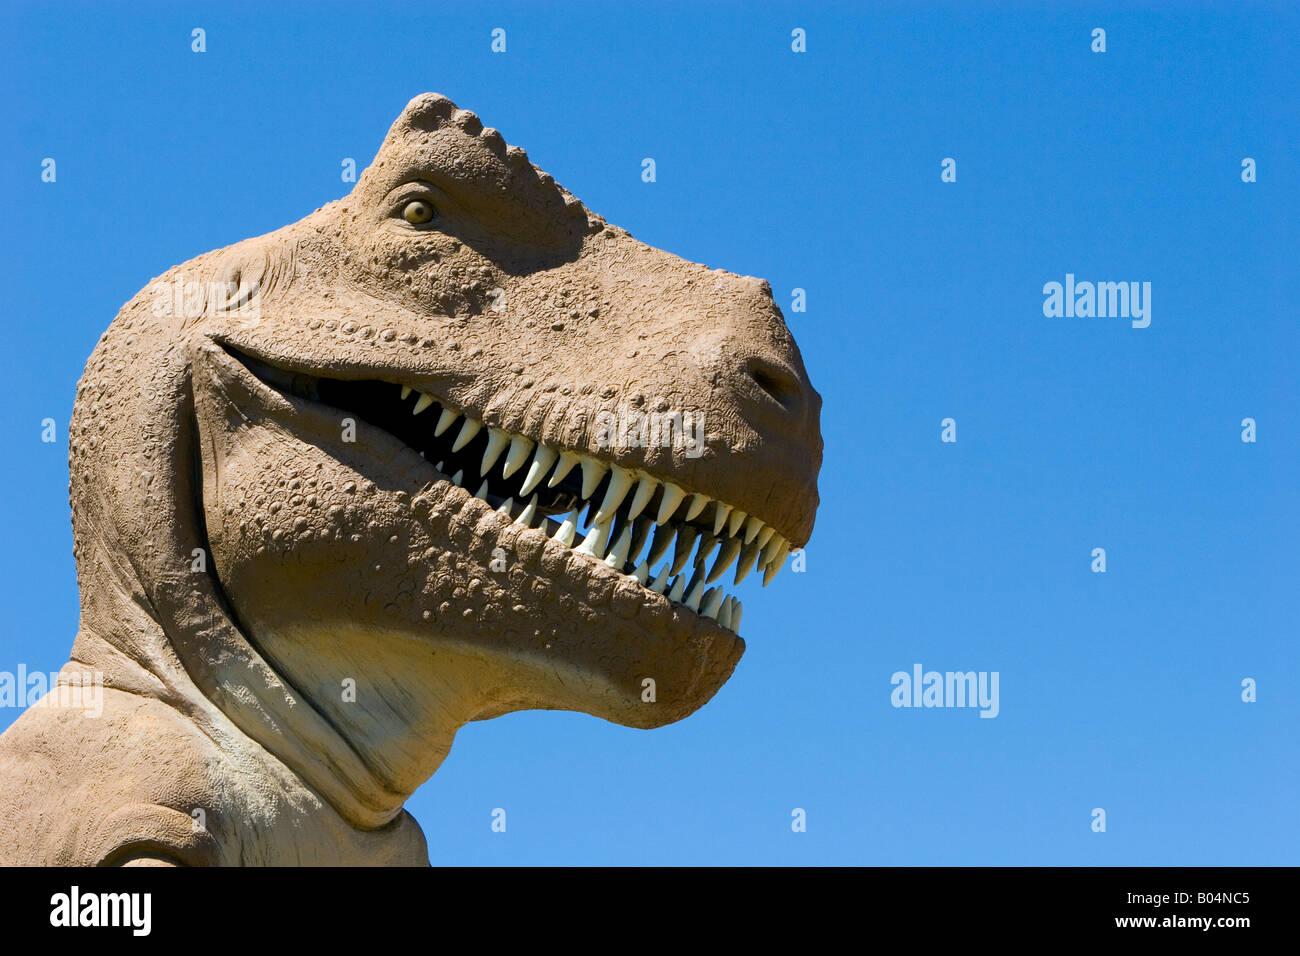 Lifesize Tyrannosaurus Rex at Dinosaur Valley State Park - Stock Image